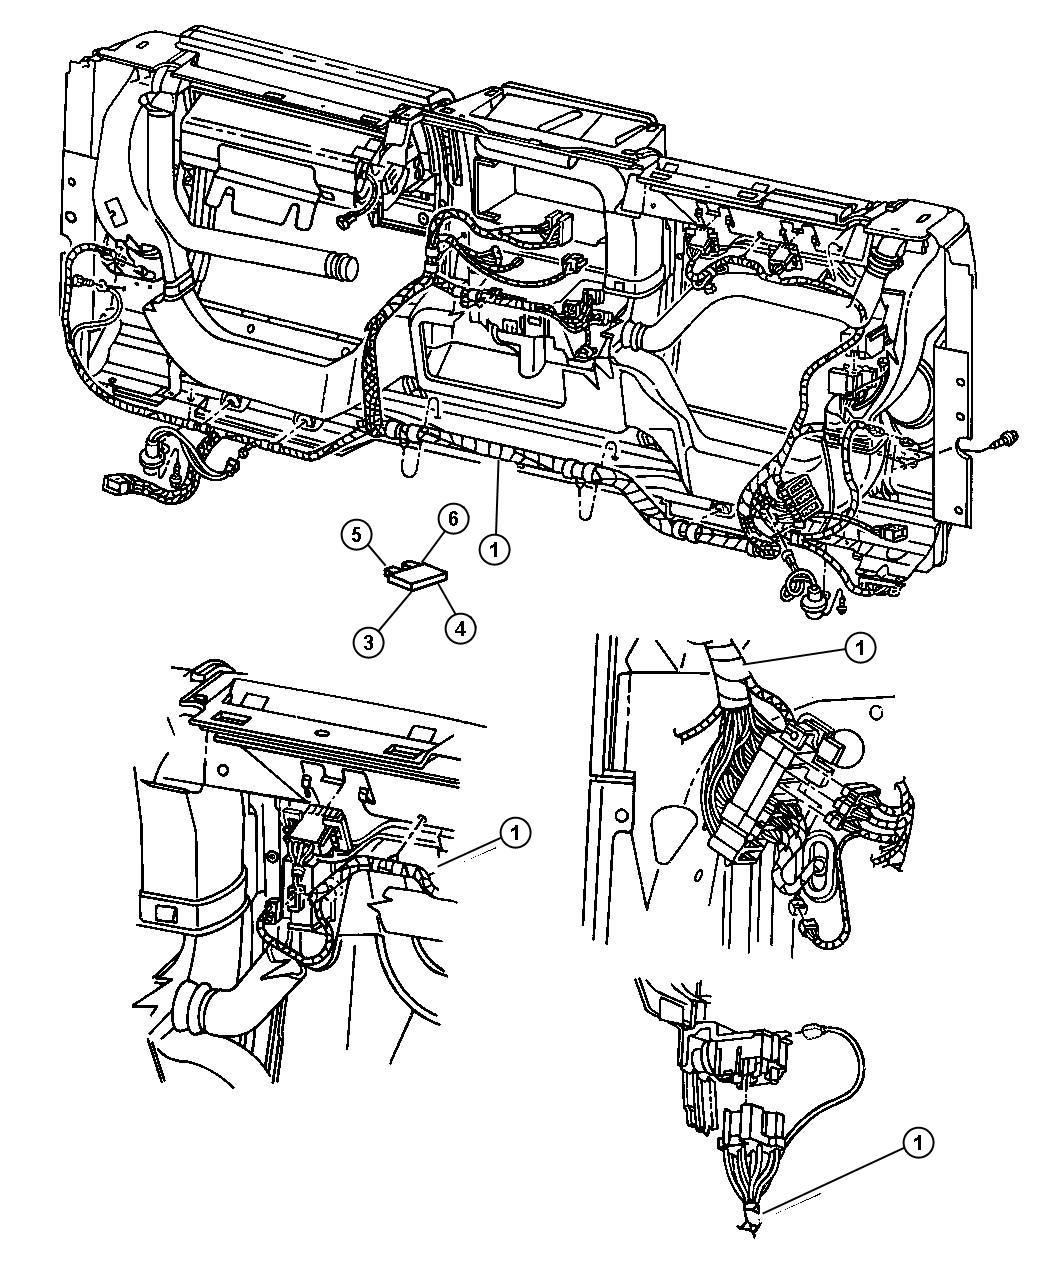 Jeep Wrangler Wiring. Instrument panel. [easy folding soft